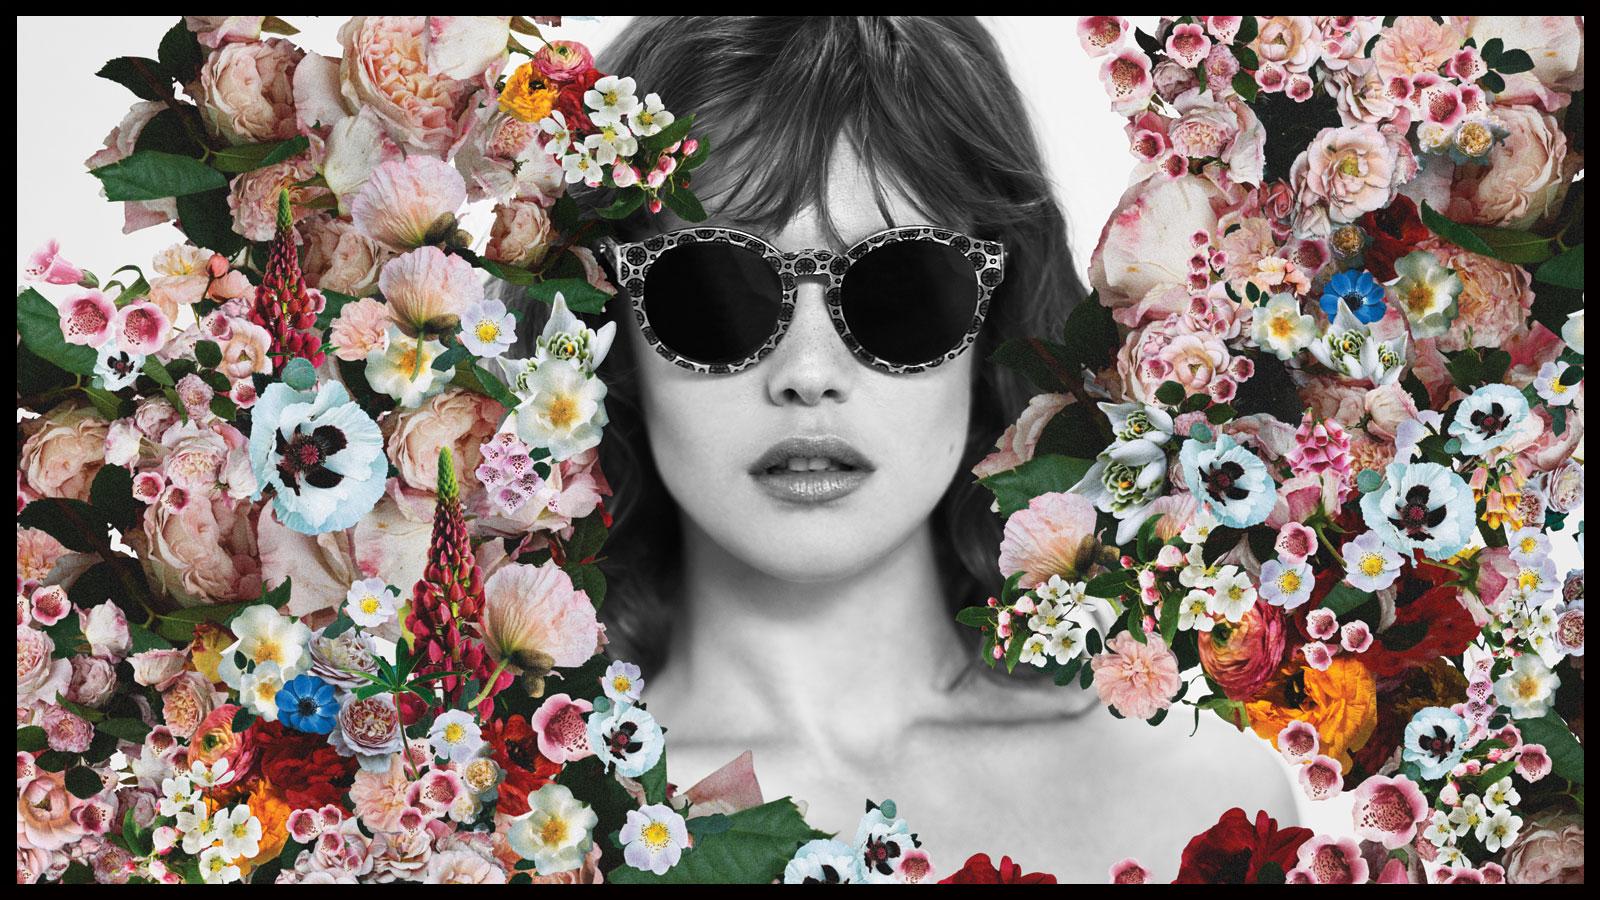 http://1.bp.blogspot.com/-nHopdU34Mkc/TyQvIg6pa0I/AAAAAAAABT4/i6FCgjCmmfk/s1600/Natalia+Vodianova+by+Mert+&+Marcus+%28Stella+McCartney+Pepe+Spring-Summer+2012%29+2.jpg